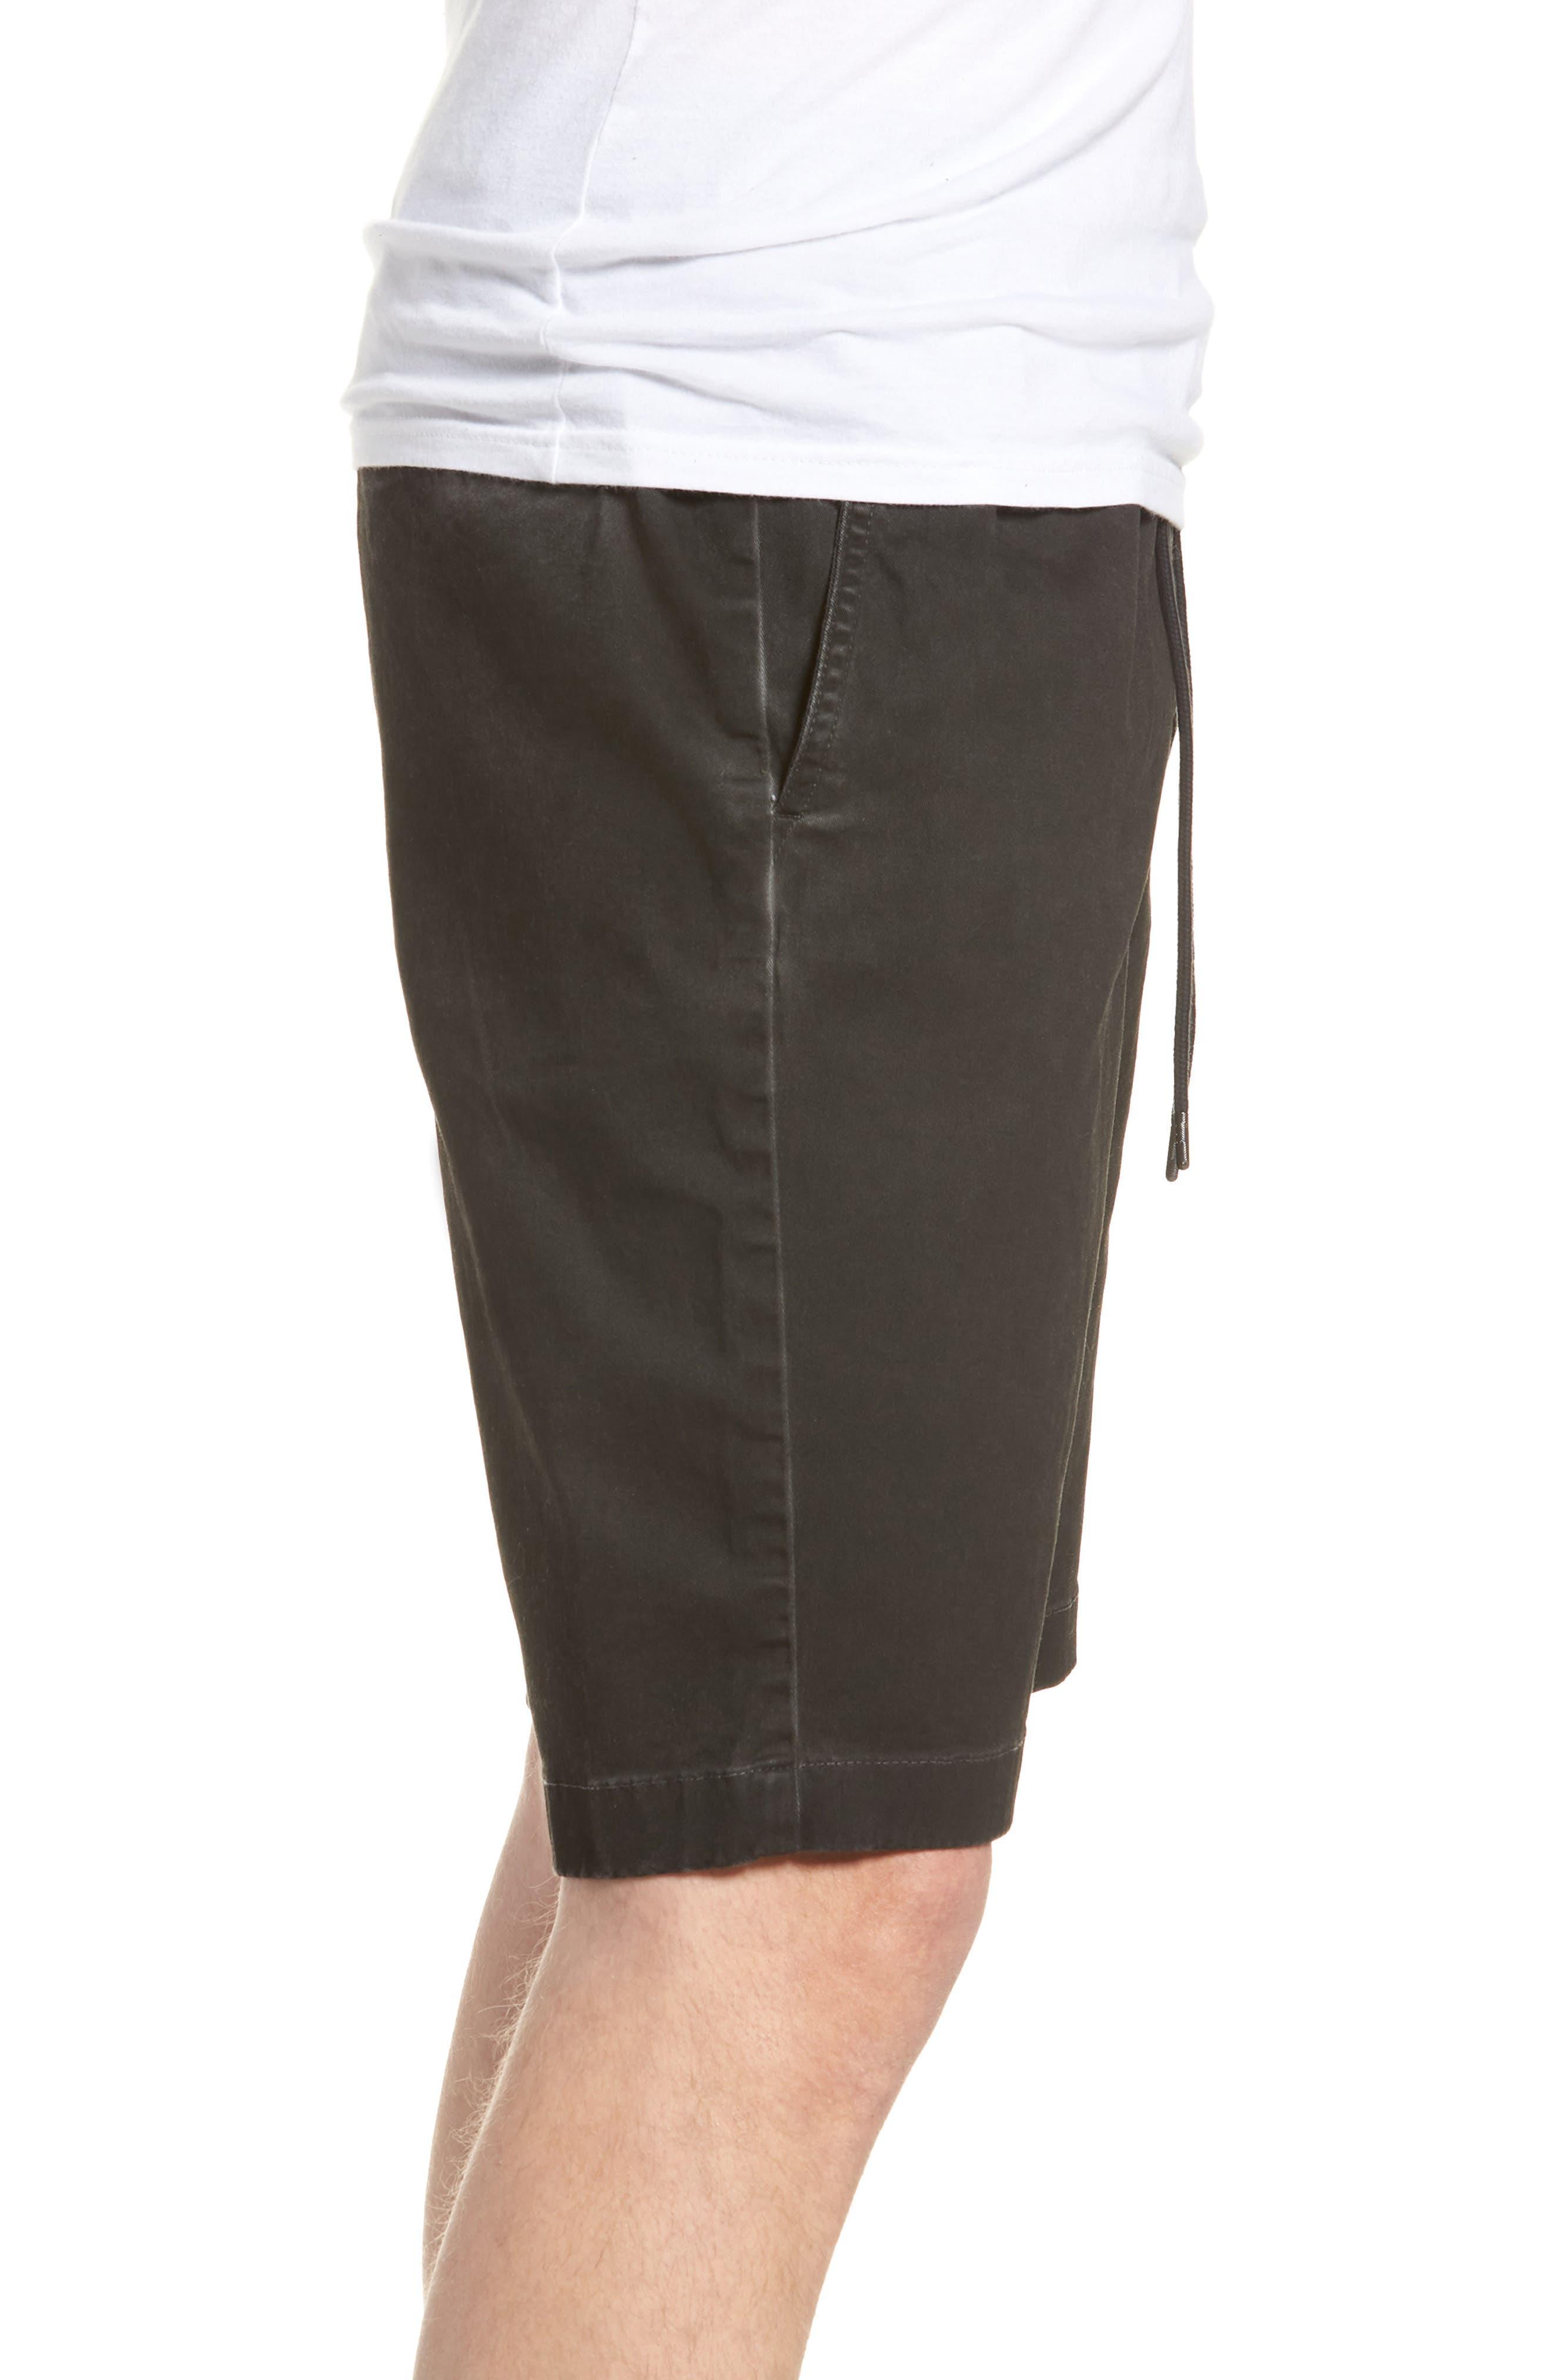 Pigment Dye Volley Shorts,                             Alternate thumbnail 3, color,                             Grey Onyx